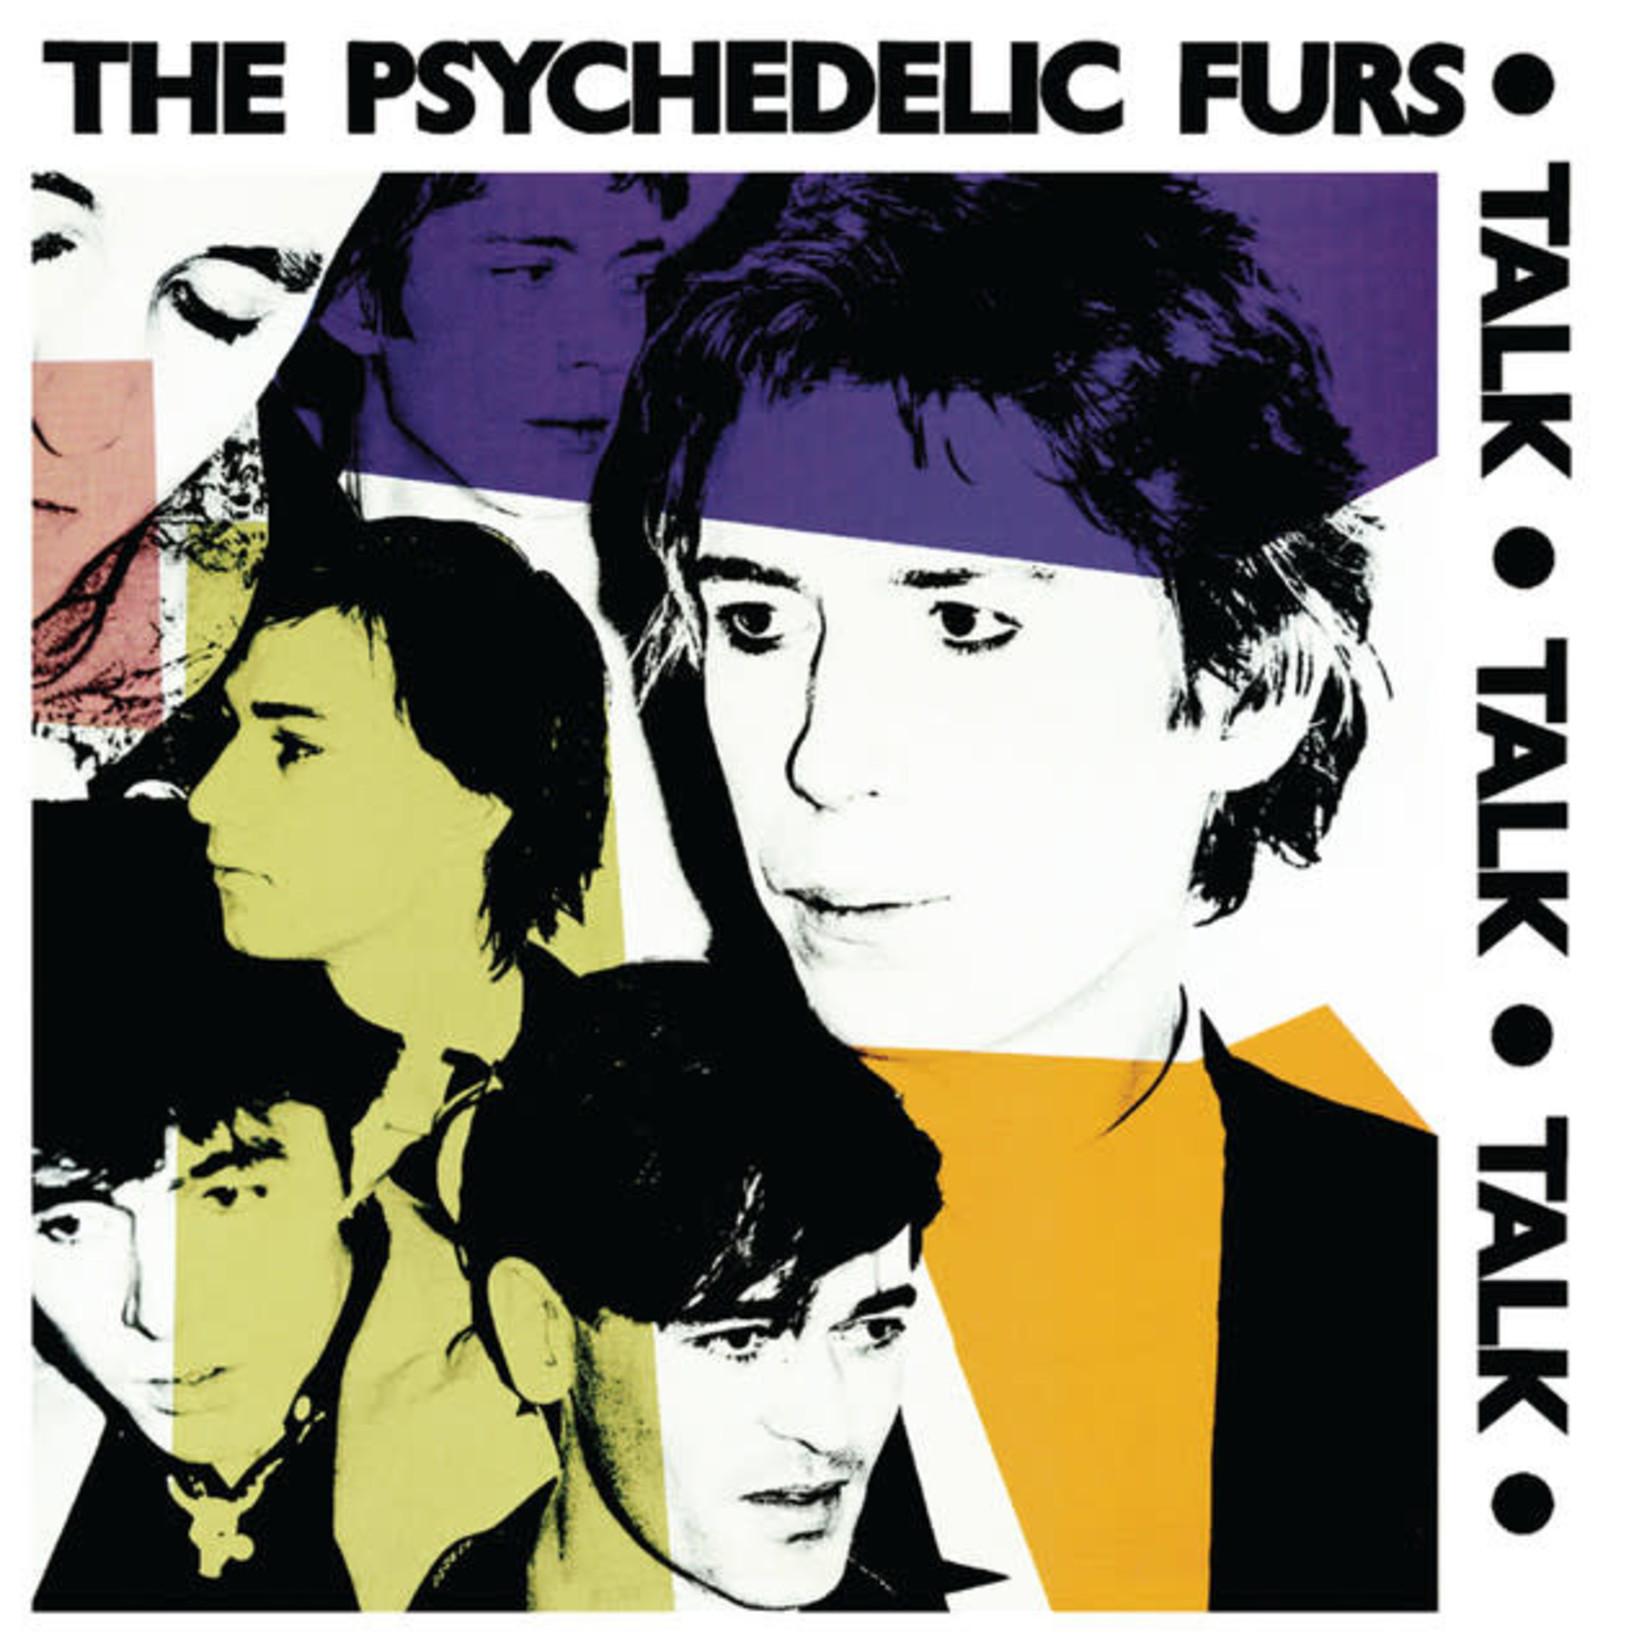 Vinyl The Psychedelic Furs - Talk Talk Talk